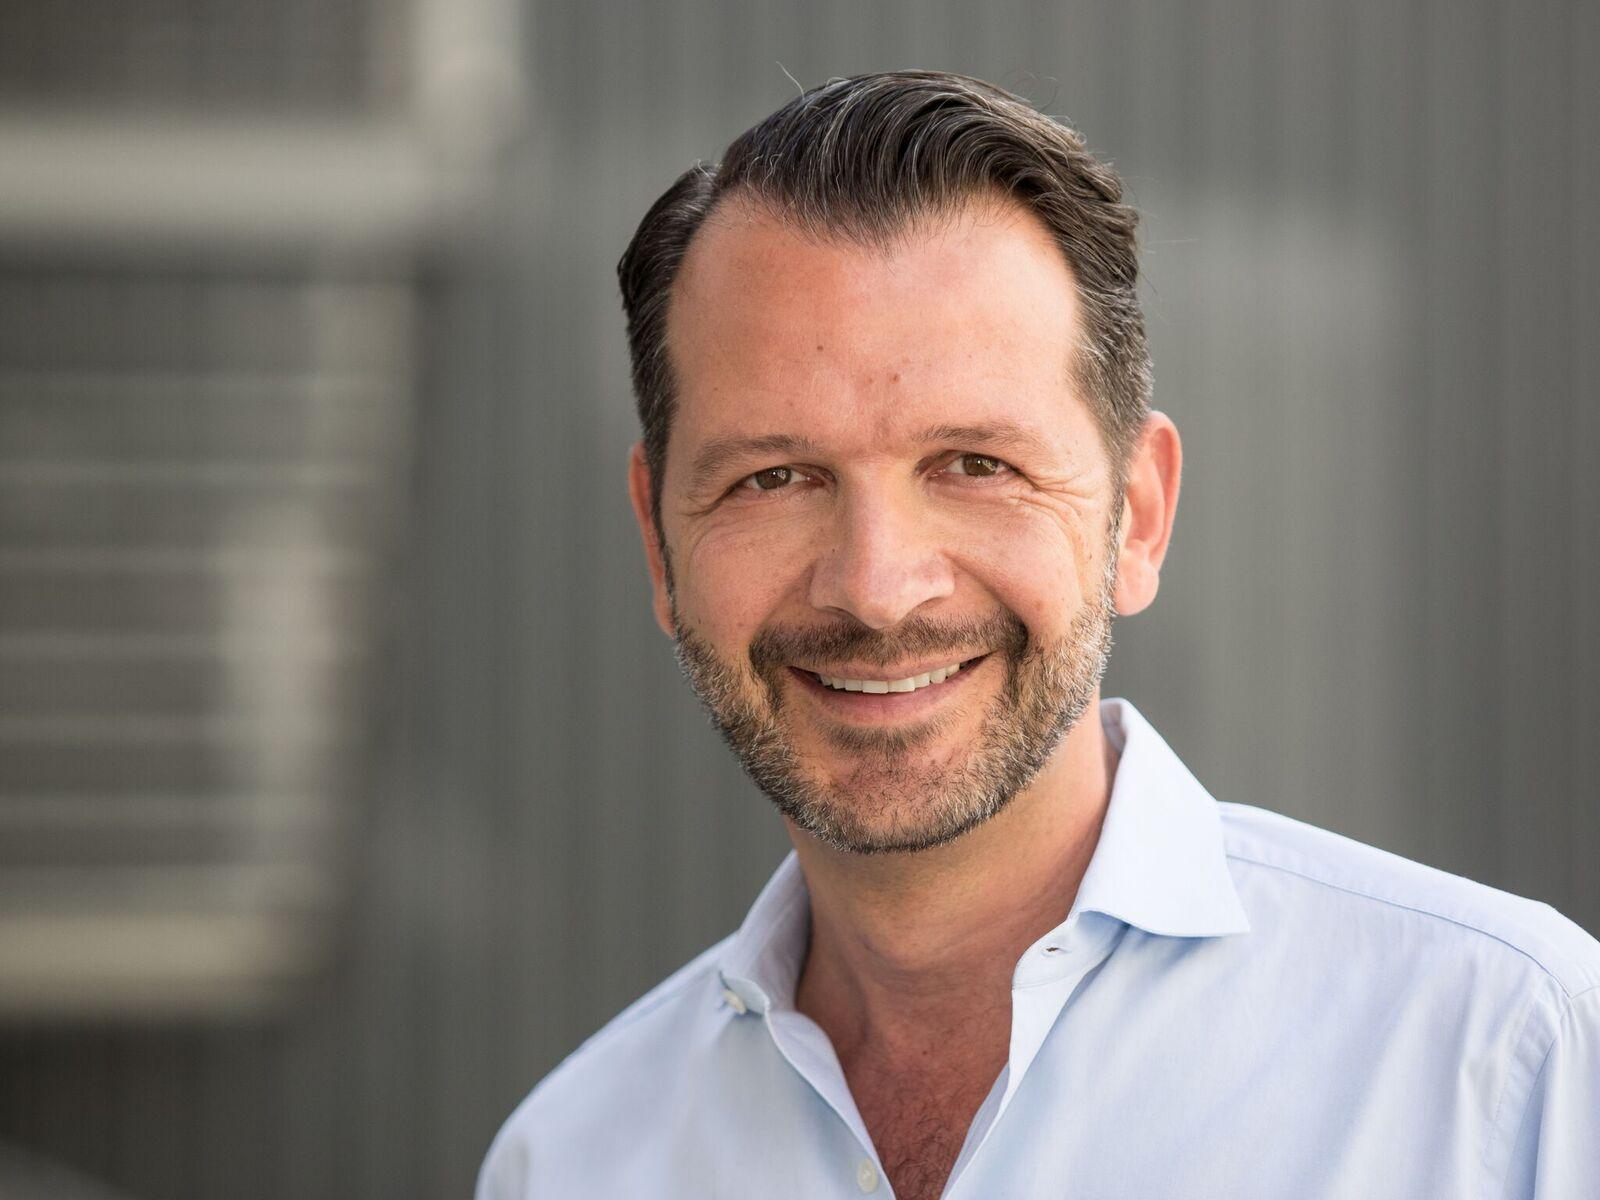 Andreas Westhoff erklärt many to many videoübertragung per app bei sport events